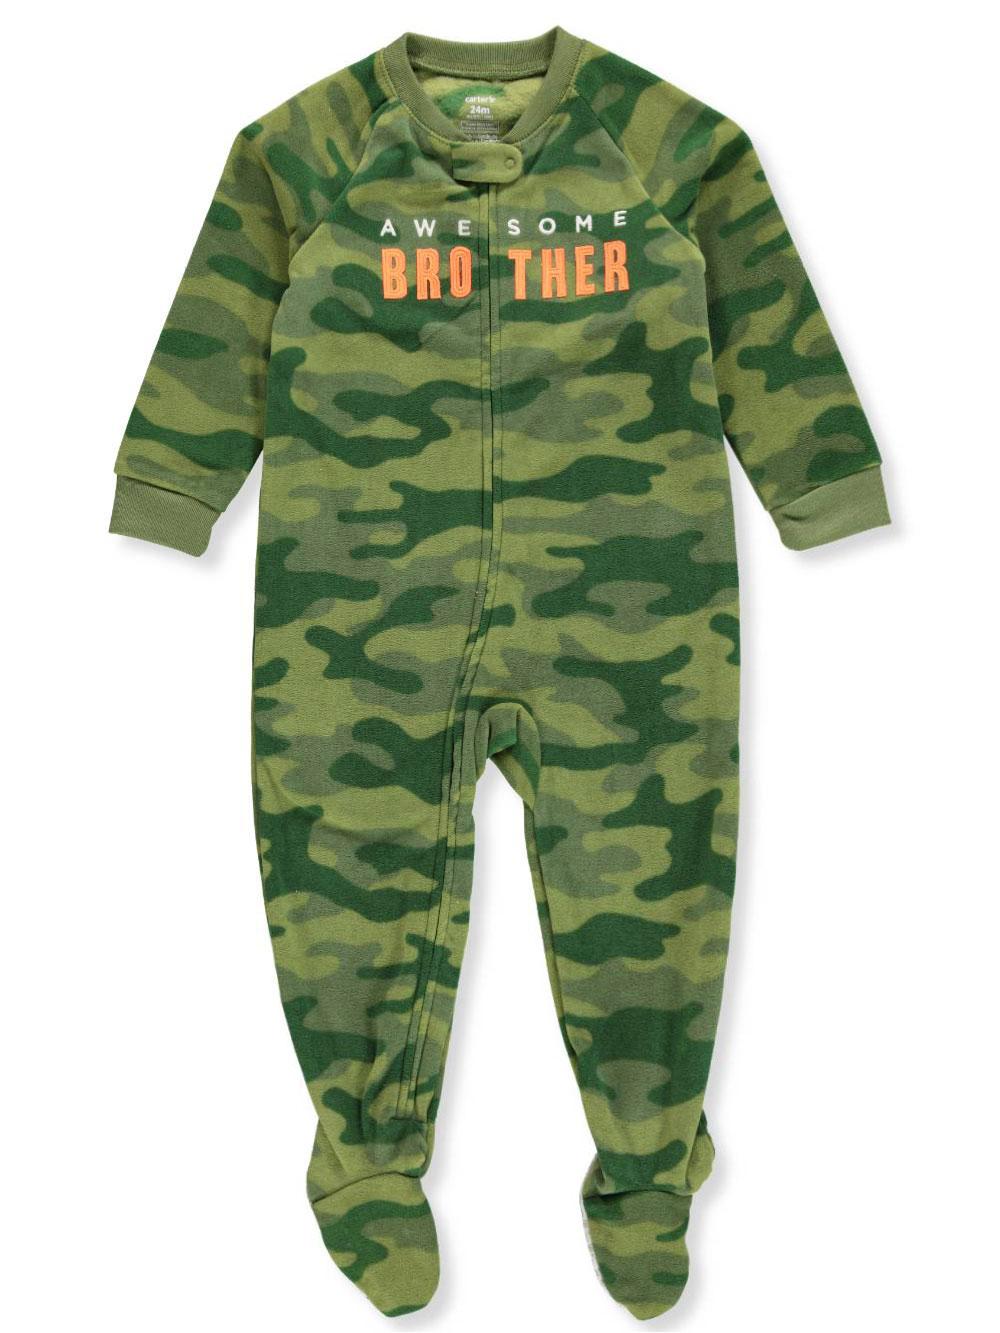 5bc06c462 Carter's Baby Boys' 1-Piece Footed Pajamas